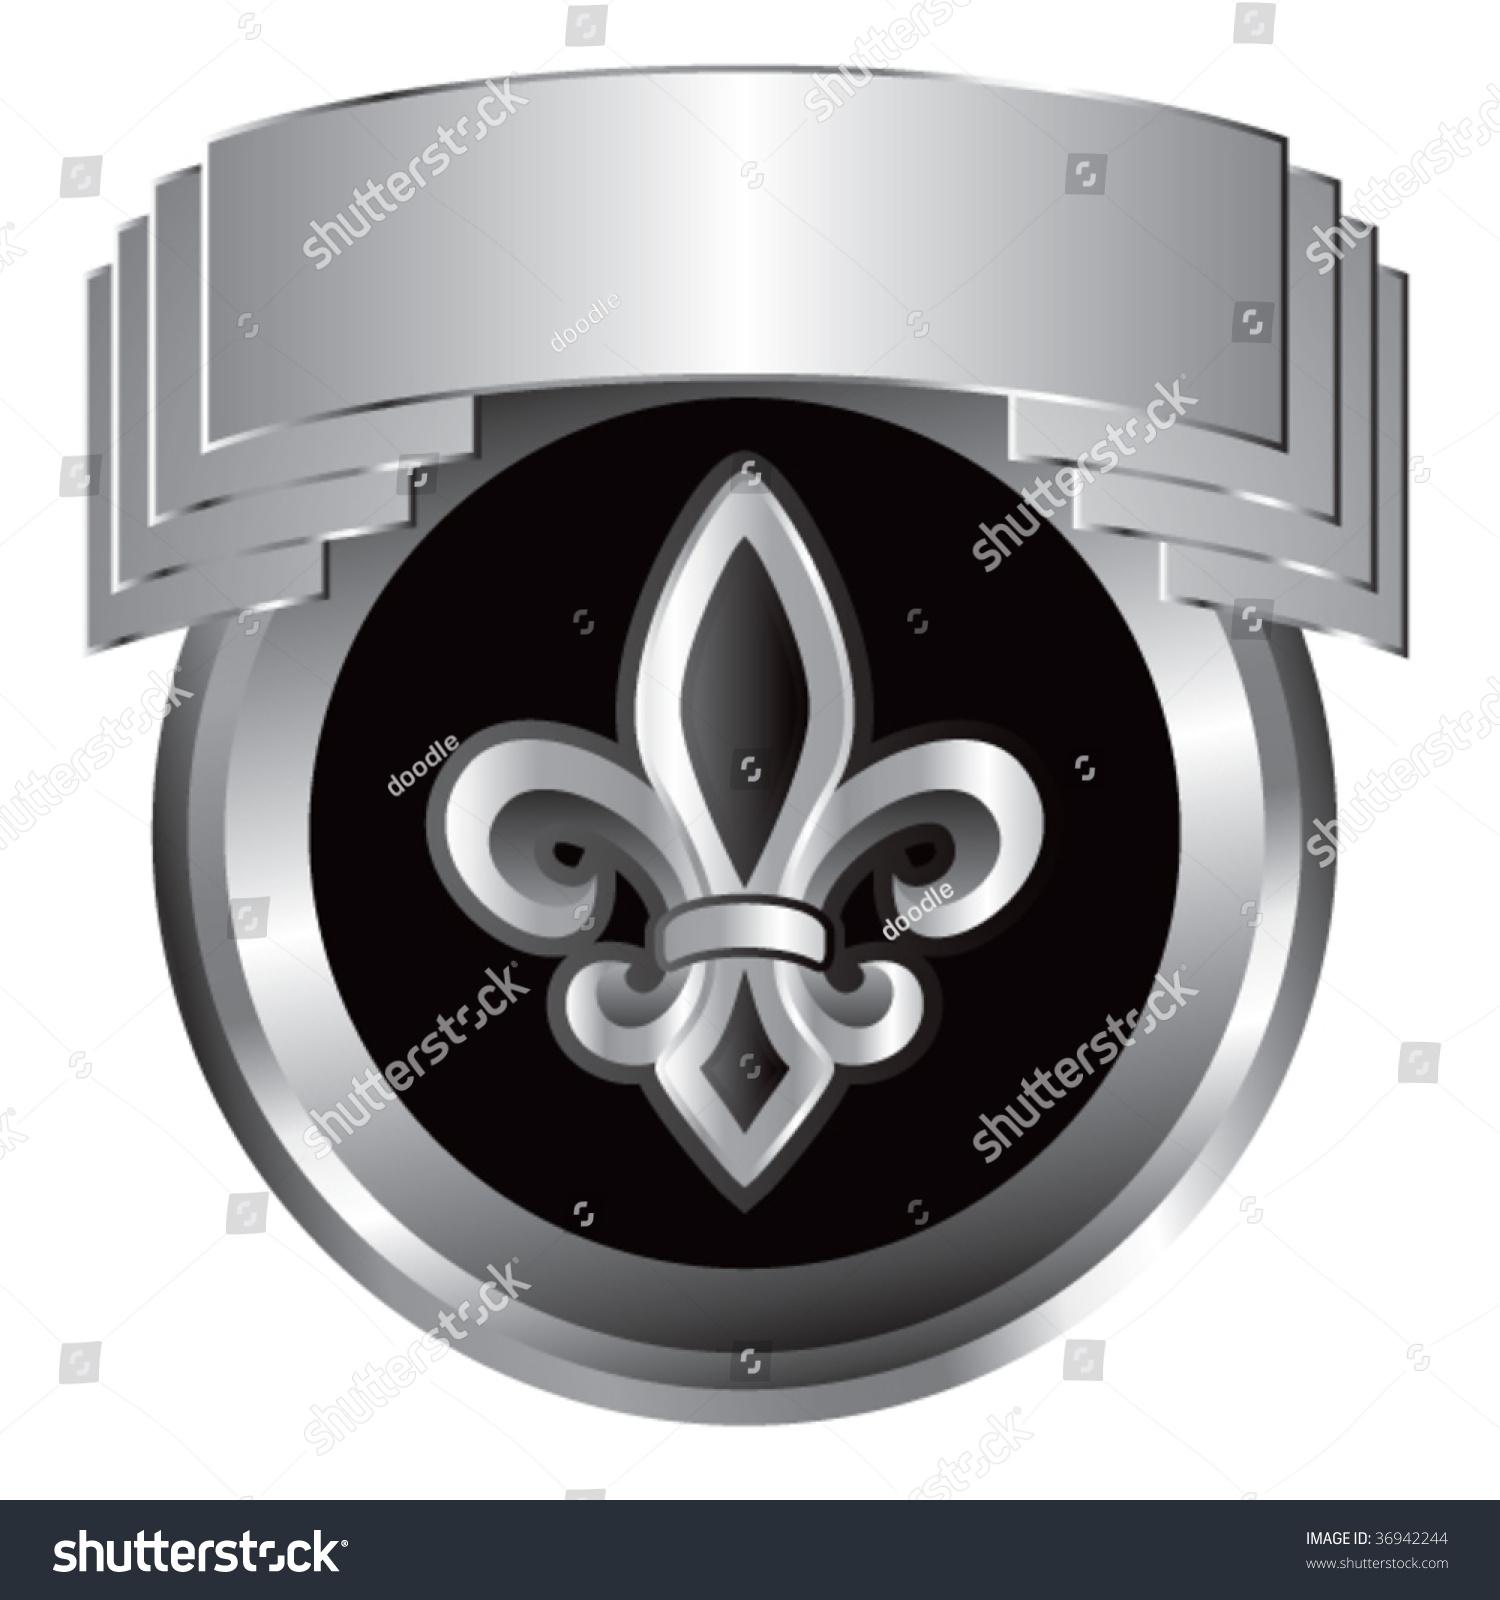 Fleur de lis symbol silver crest stock vector 36942244 shutterstock fleur de lis symbol silver crest biocorpaavc